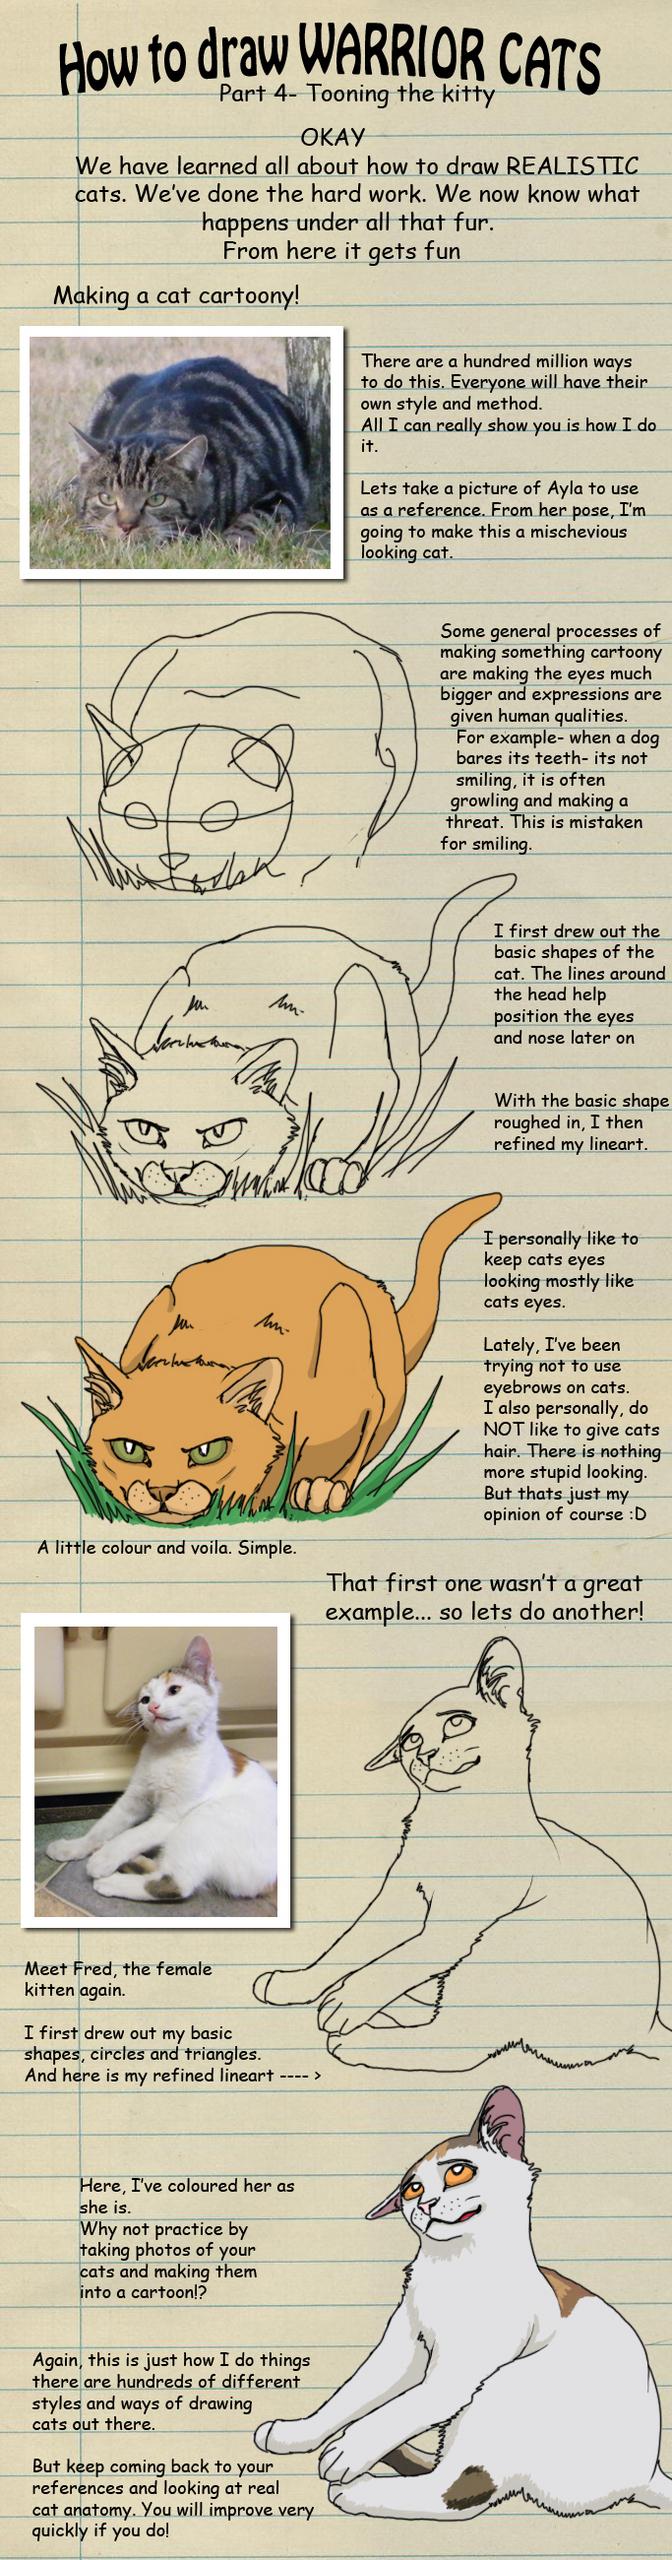 Warrior Cat Obsessed Fan Club Bilder How To Draw A Warrior Cat Hd